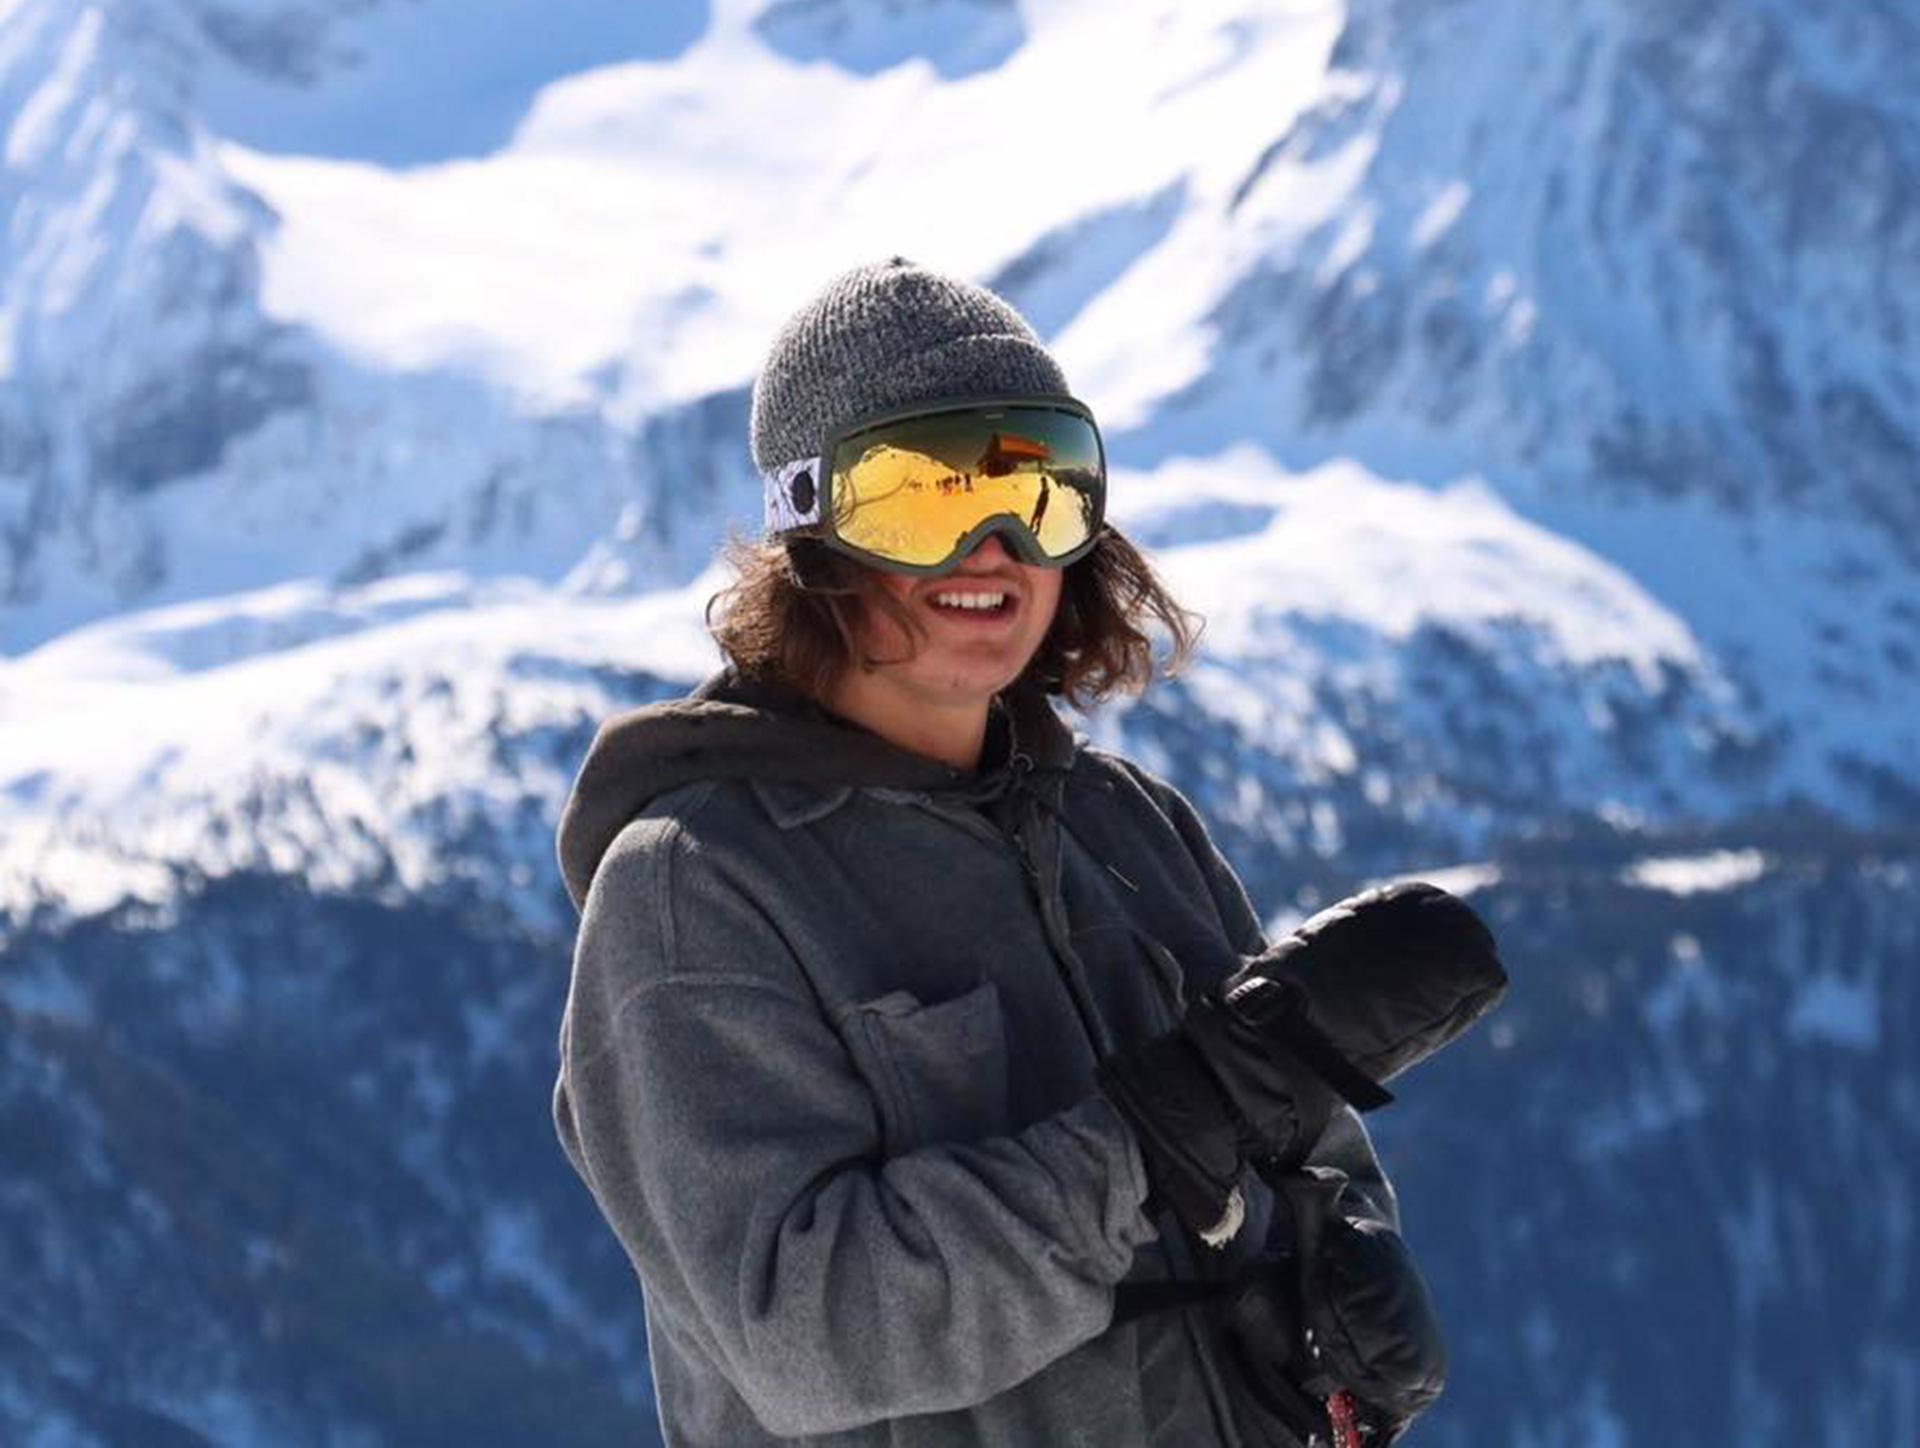 Chamrousse champion mirco ferrari ski freestyle portrait station ski isère france - © labigagence